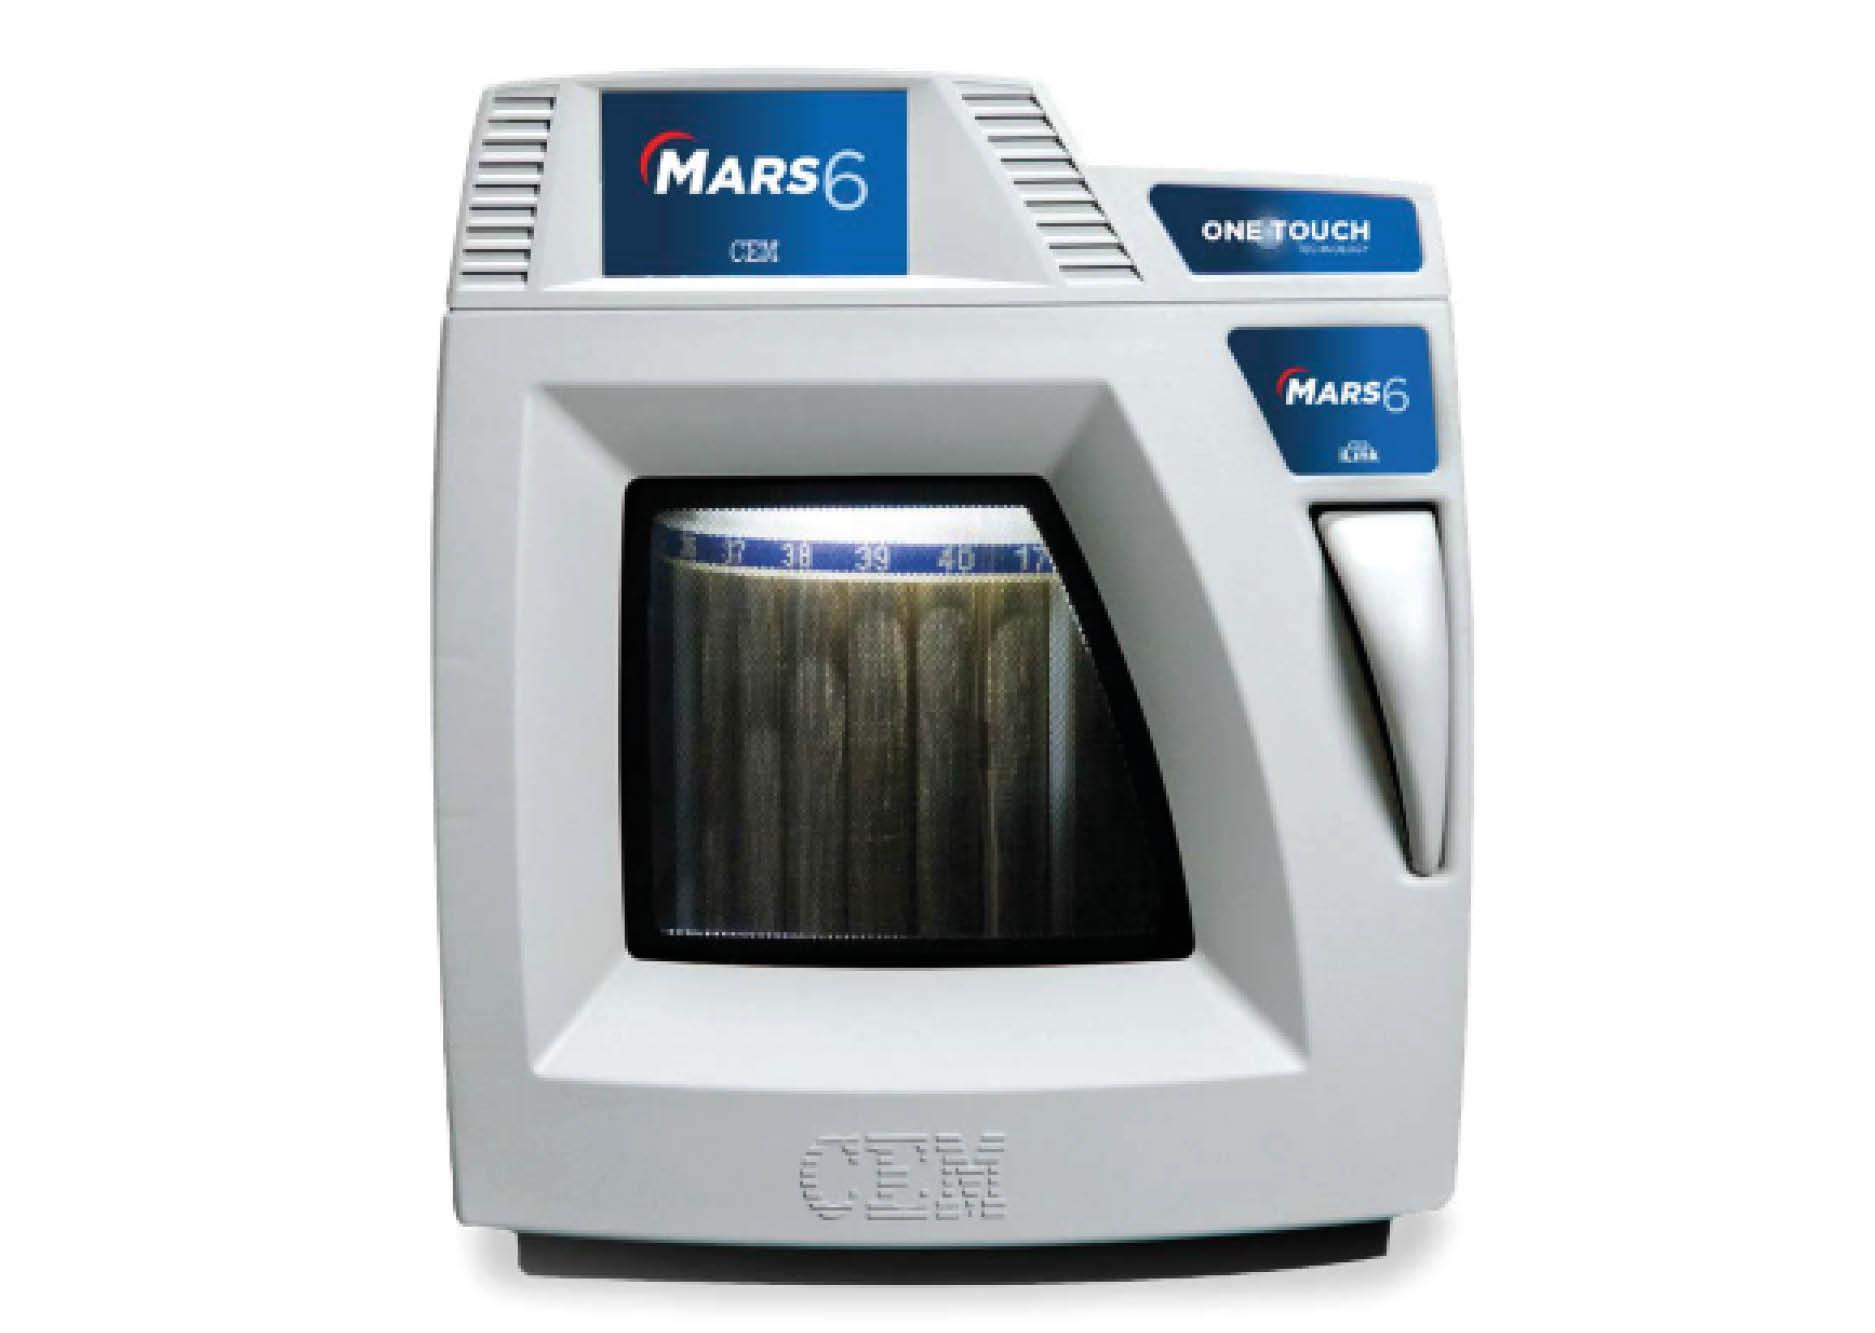 Microwave sample preparation